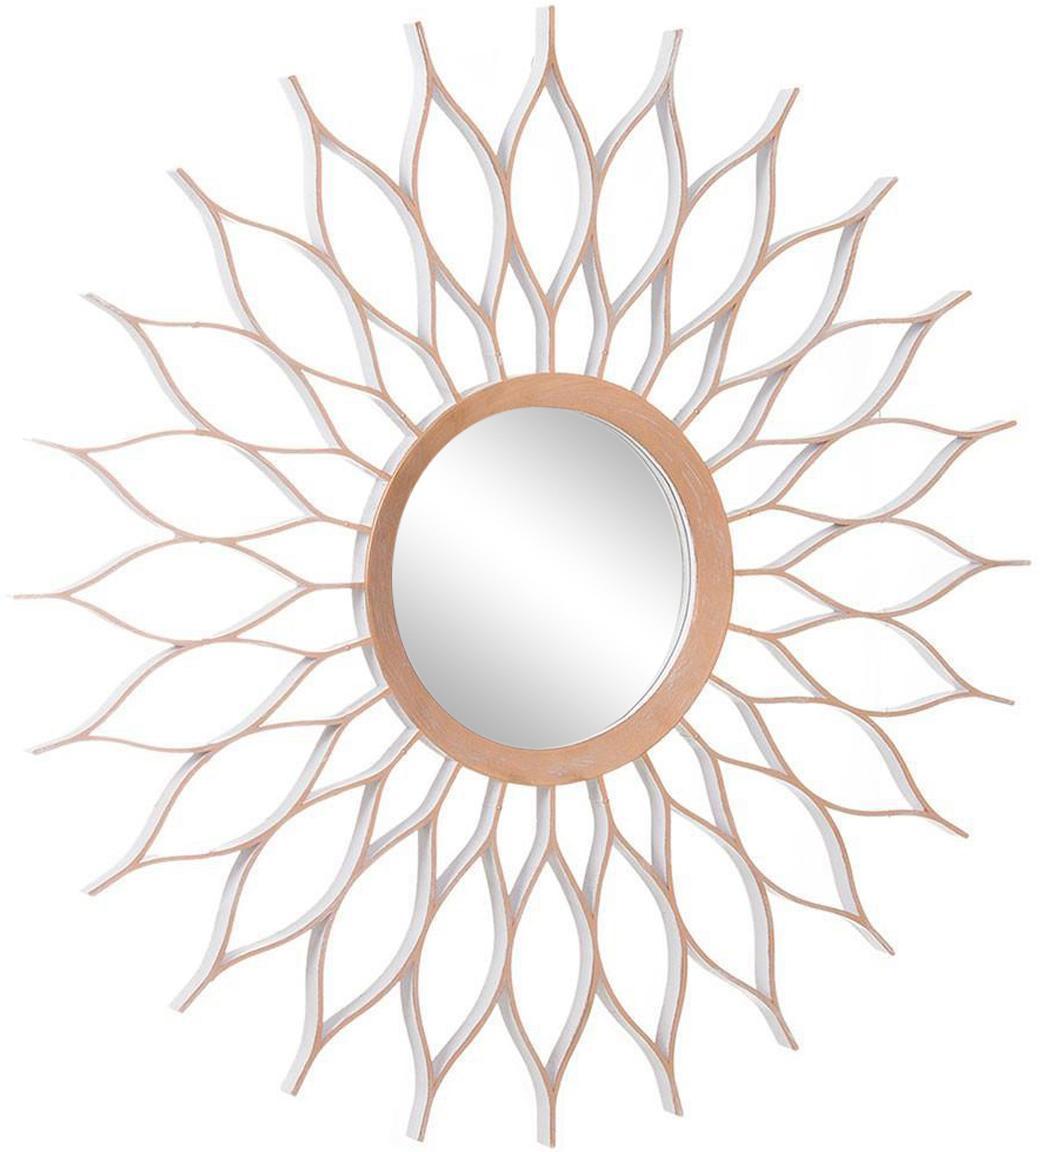 Espejo de pared Kubas World, Plástico, espejo de cristal, Bronce, Ø 52 cm